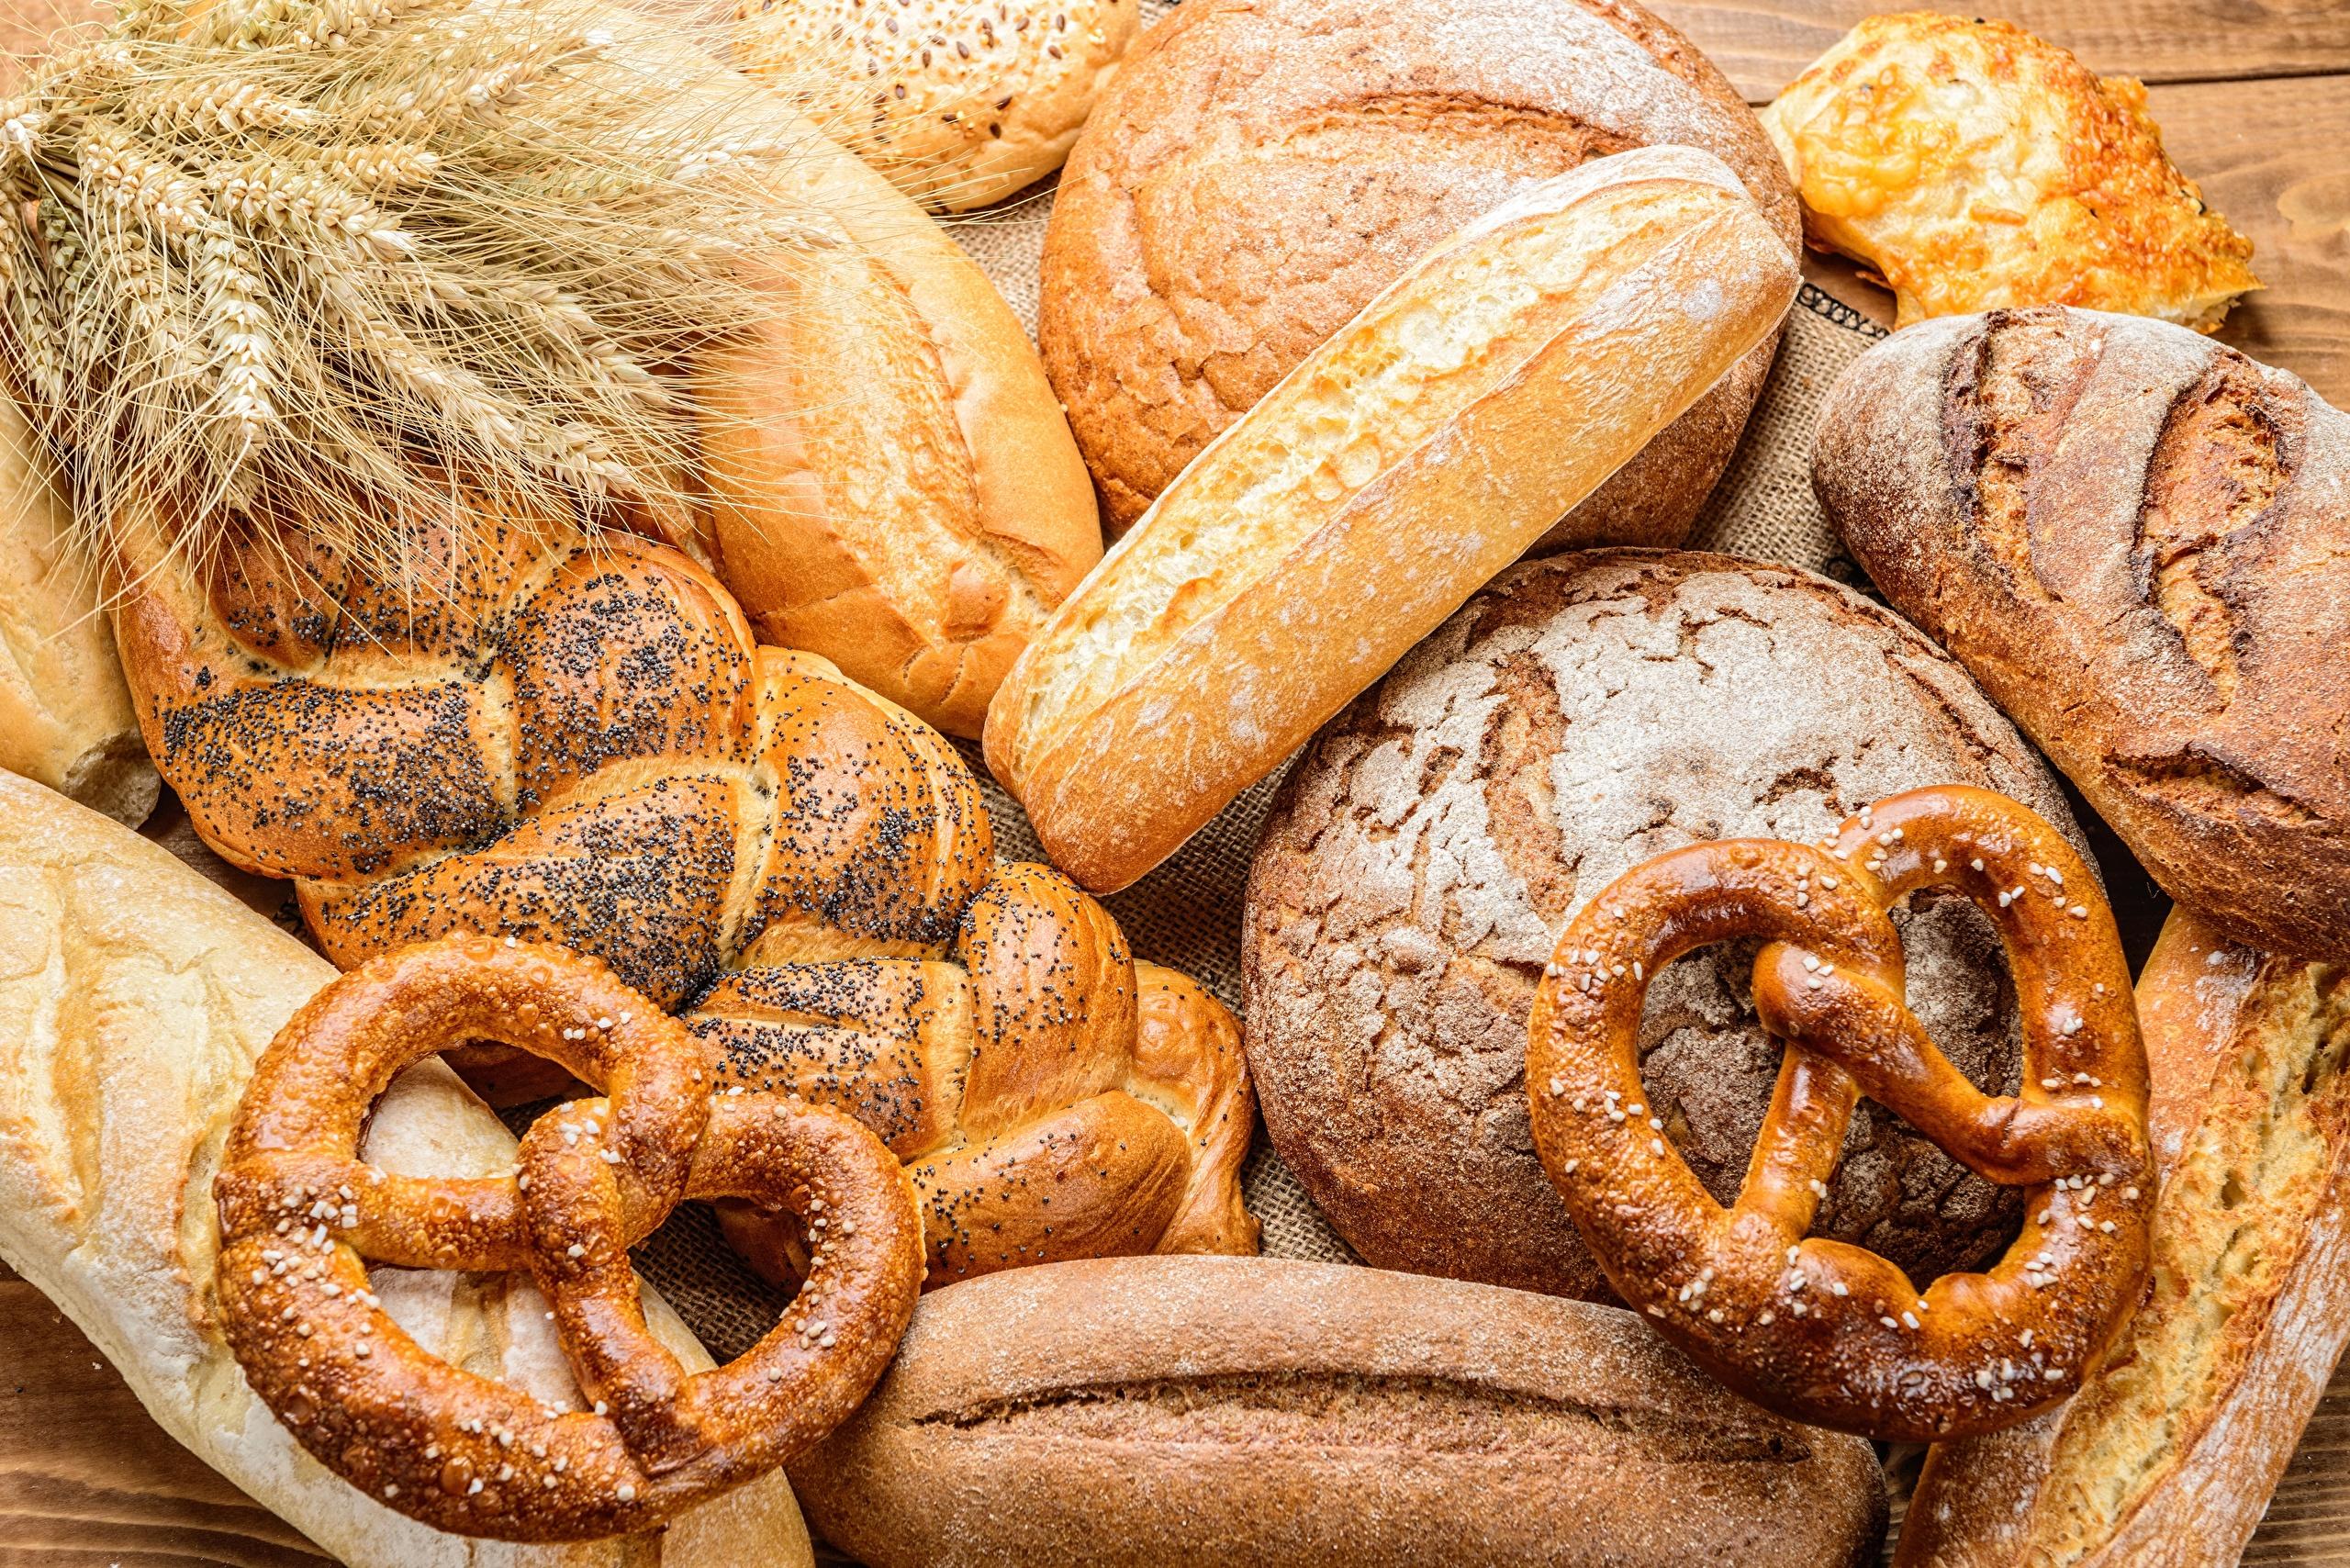 http://sdc.luga.ru/media/1002/bread-kringleear-botany-490850.jpg